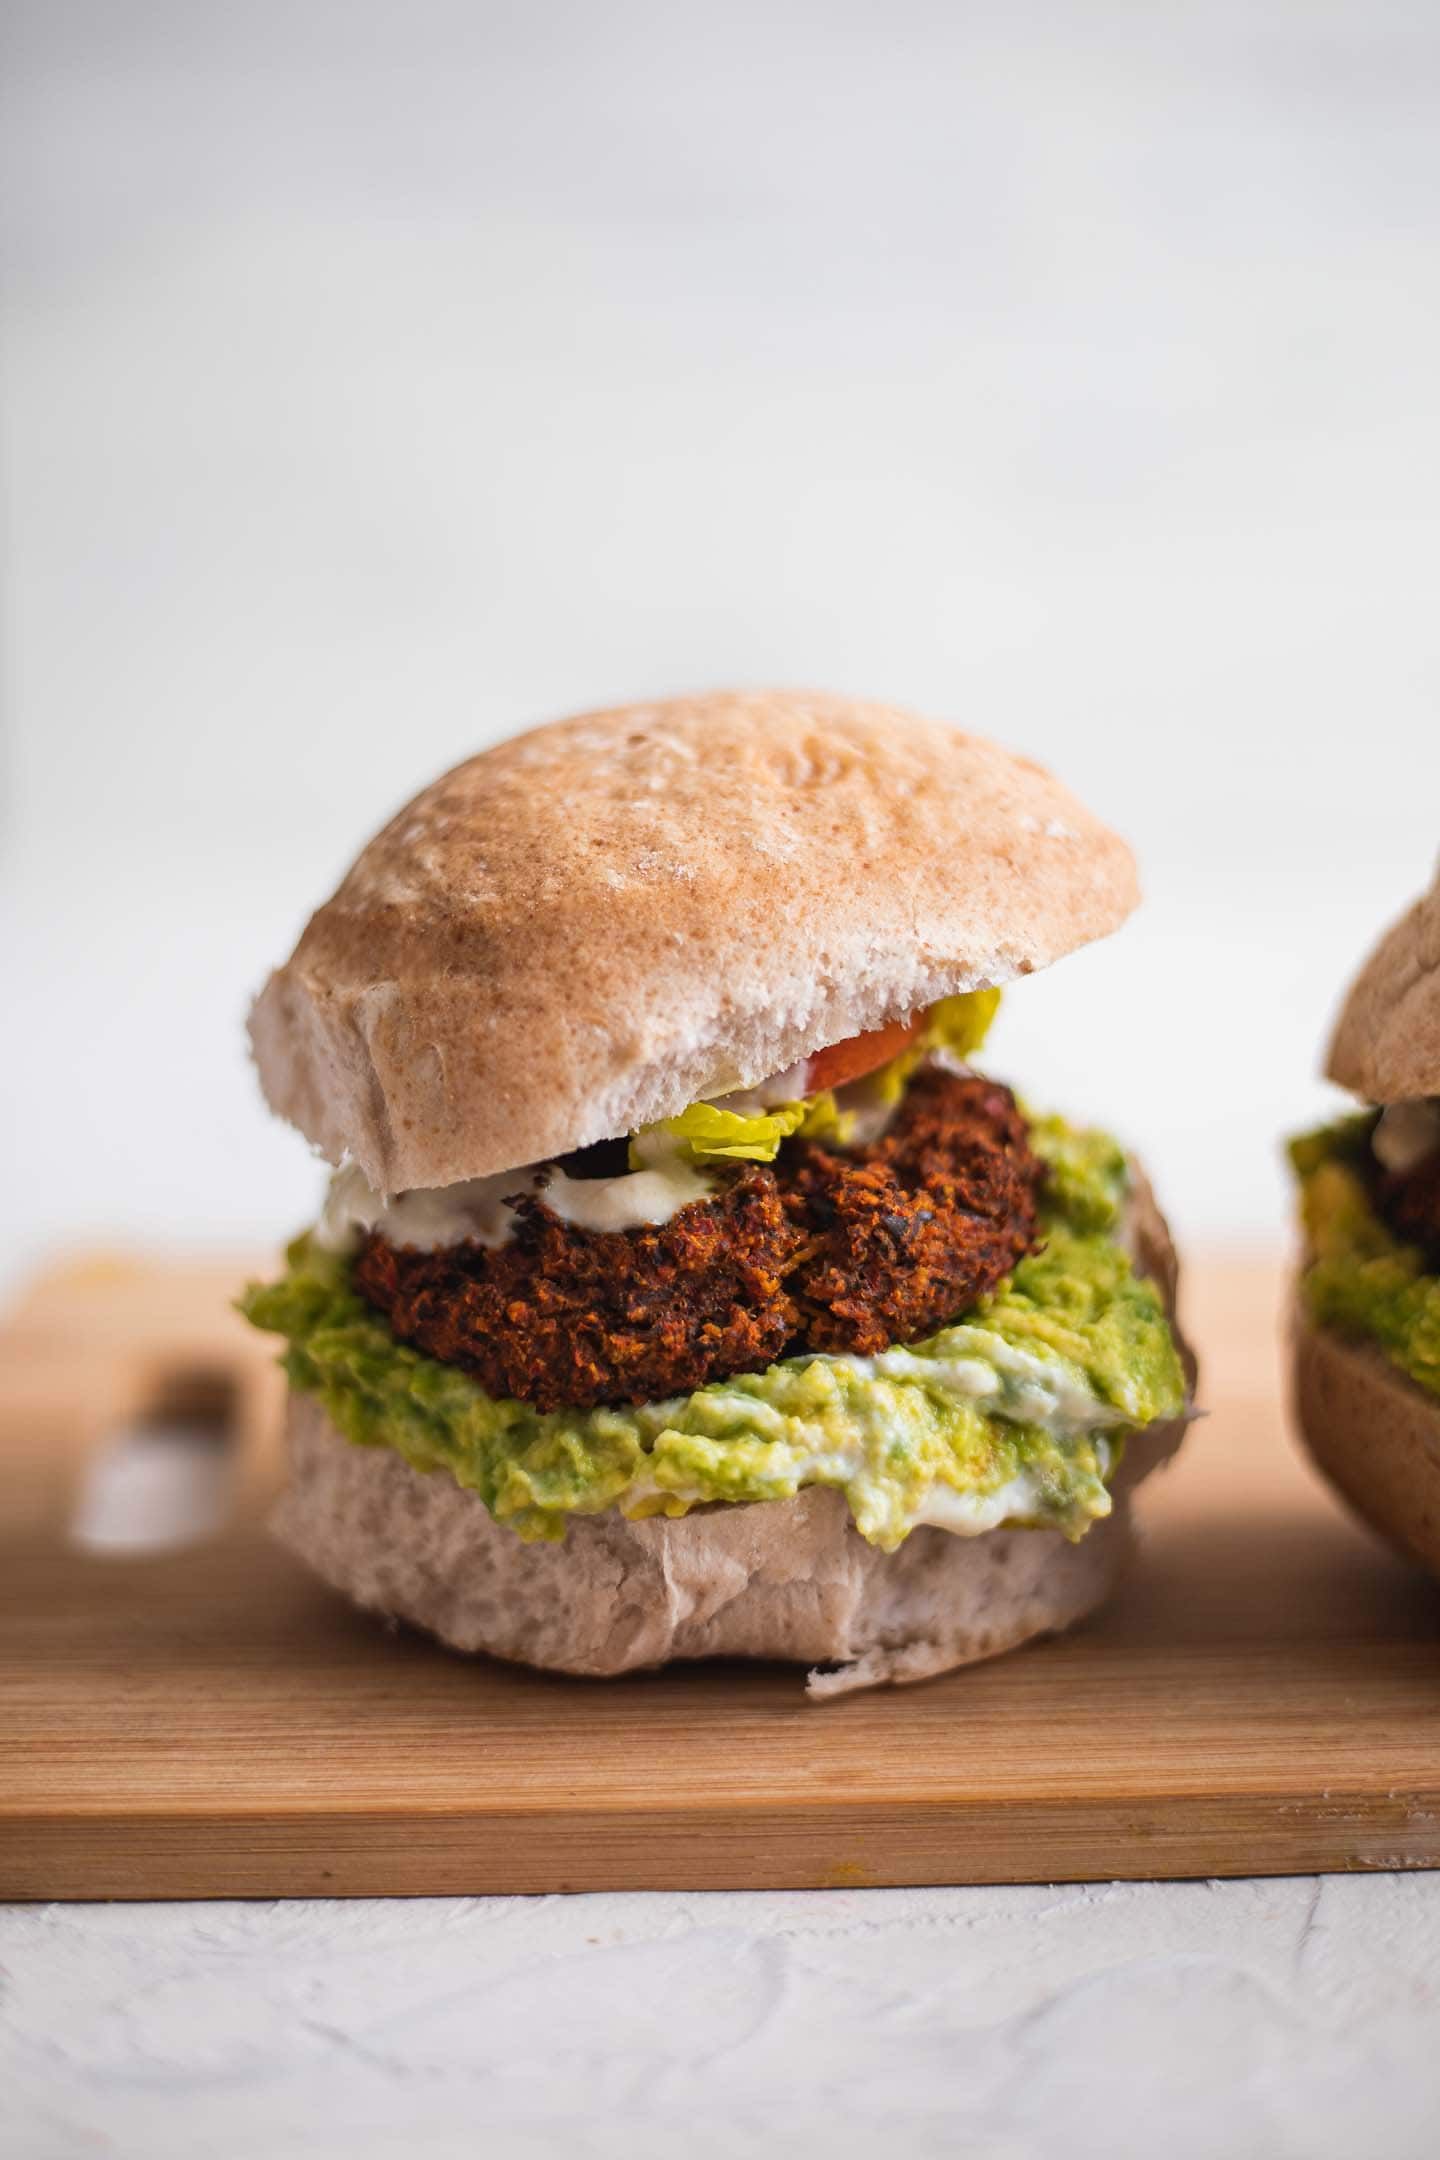 Vegan burgers with black beans and sweet potato